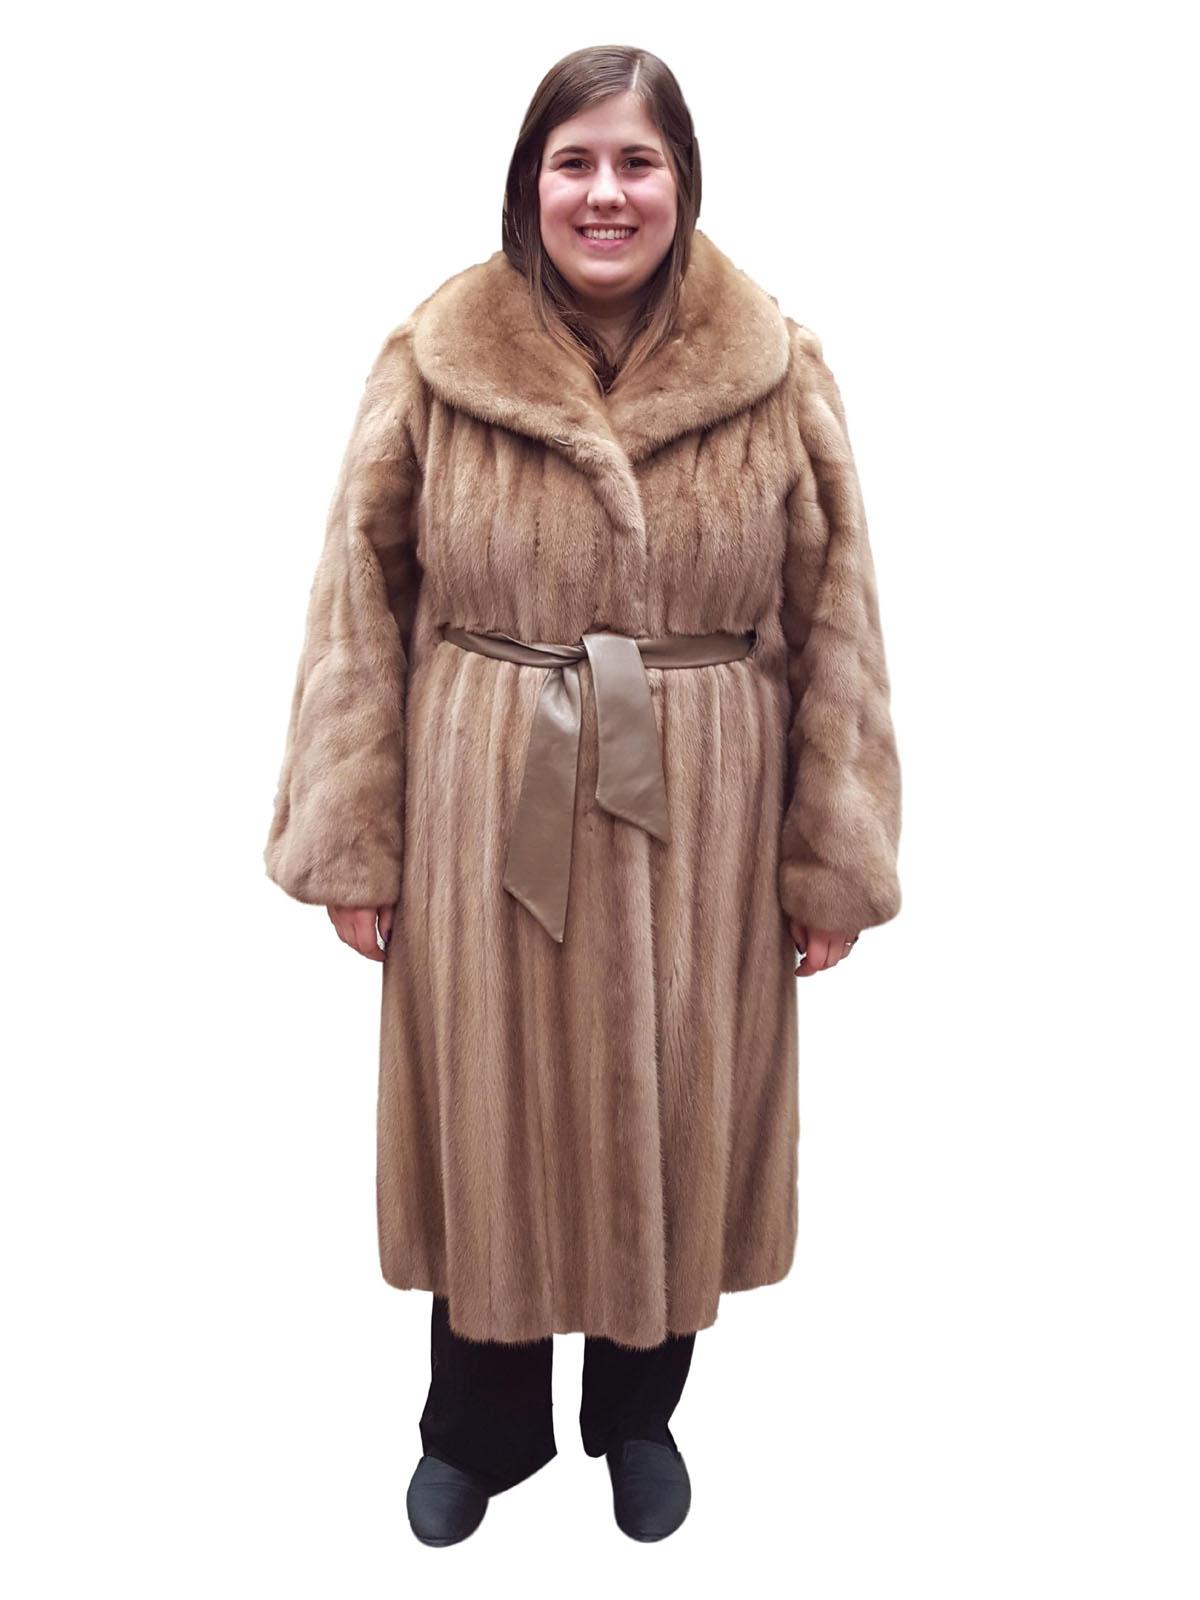 Autumn Haze Mink Coat with Leather Belt